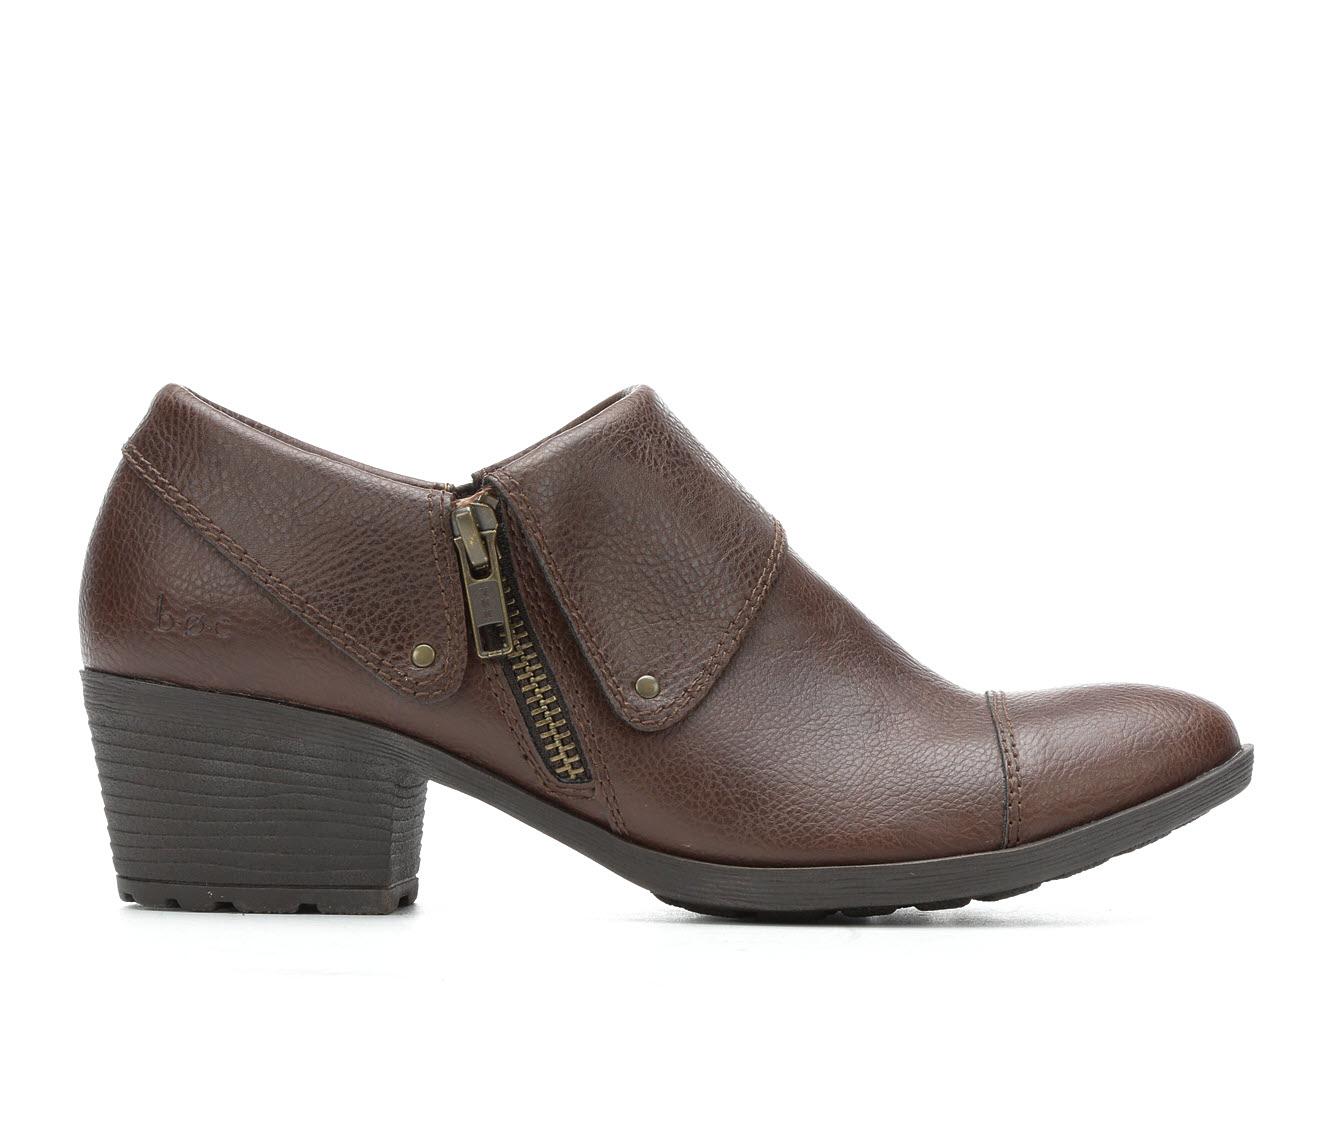 B.O.C. Rosemela Women's Shoe (Brown Leather)